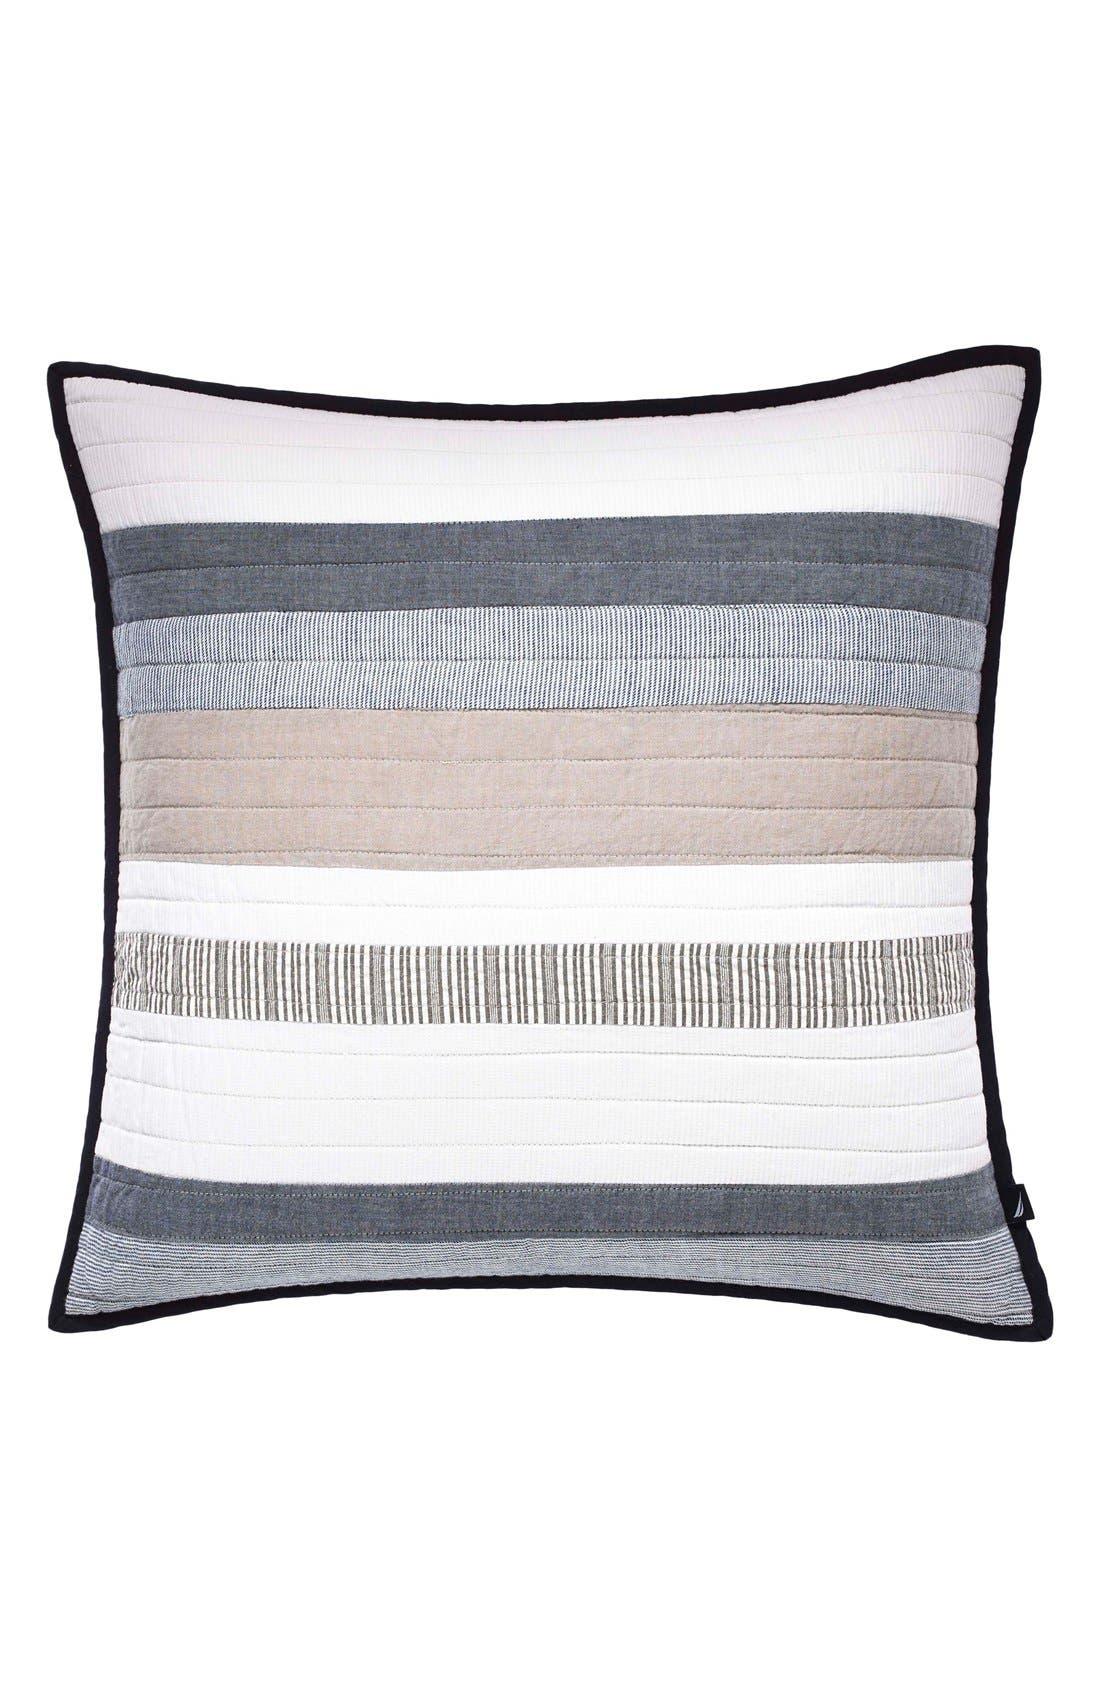 'Tideaway' Pillow,                         Main,                         color, 020